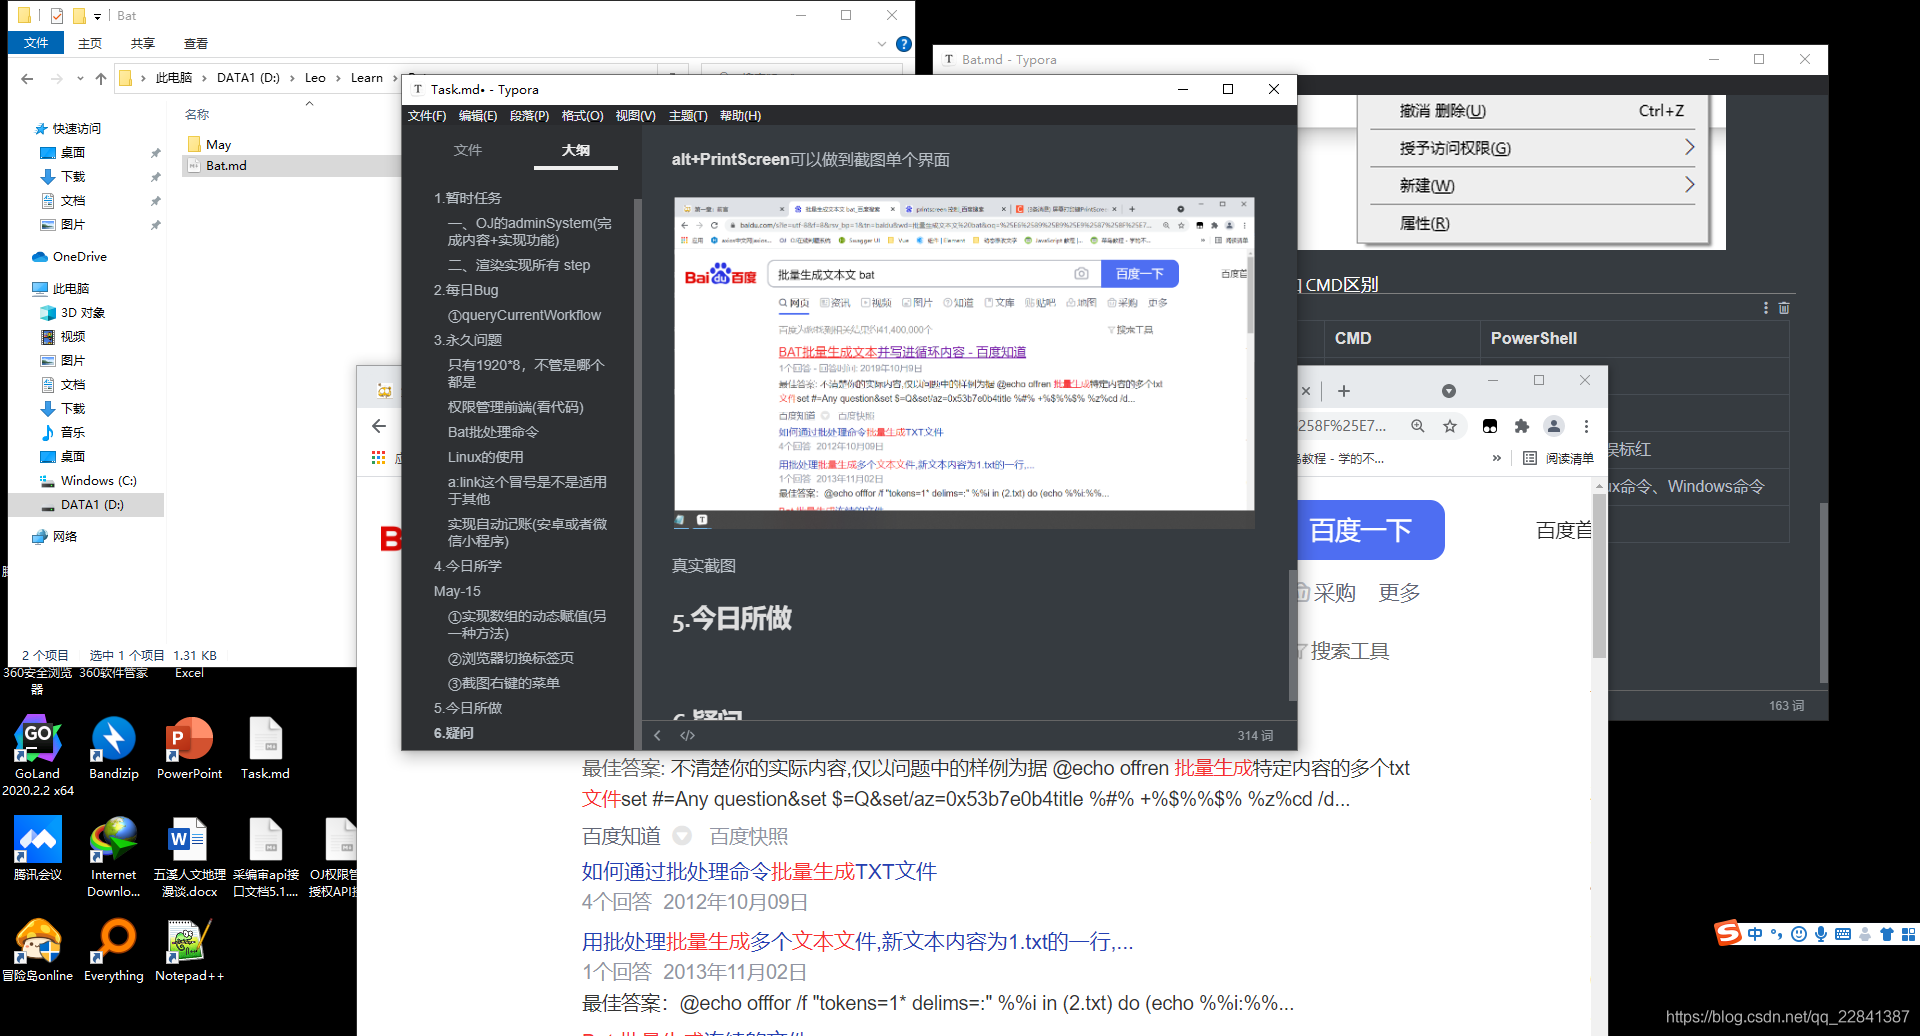 [外链图片转存失败,源站可能有防盗链机制,建议将图片保存下来直接上传(img-1leCp7de-1621149058736)(C:\Users\Uuuu\AppData\Roaming\Typora\typora-user-images\image-20210515203830887.png)]